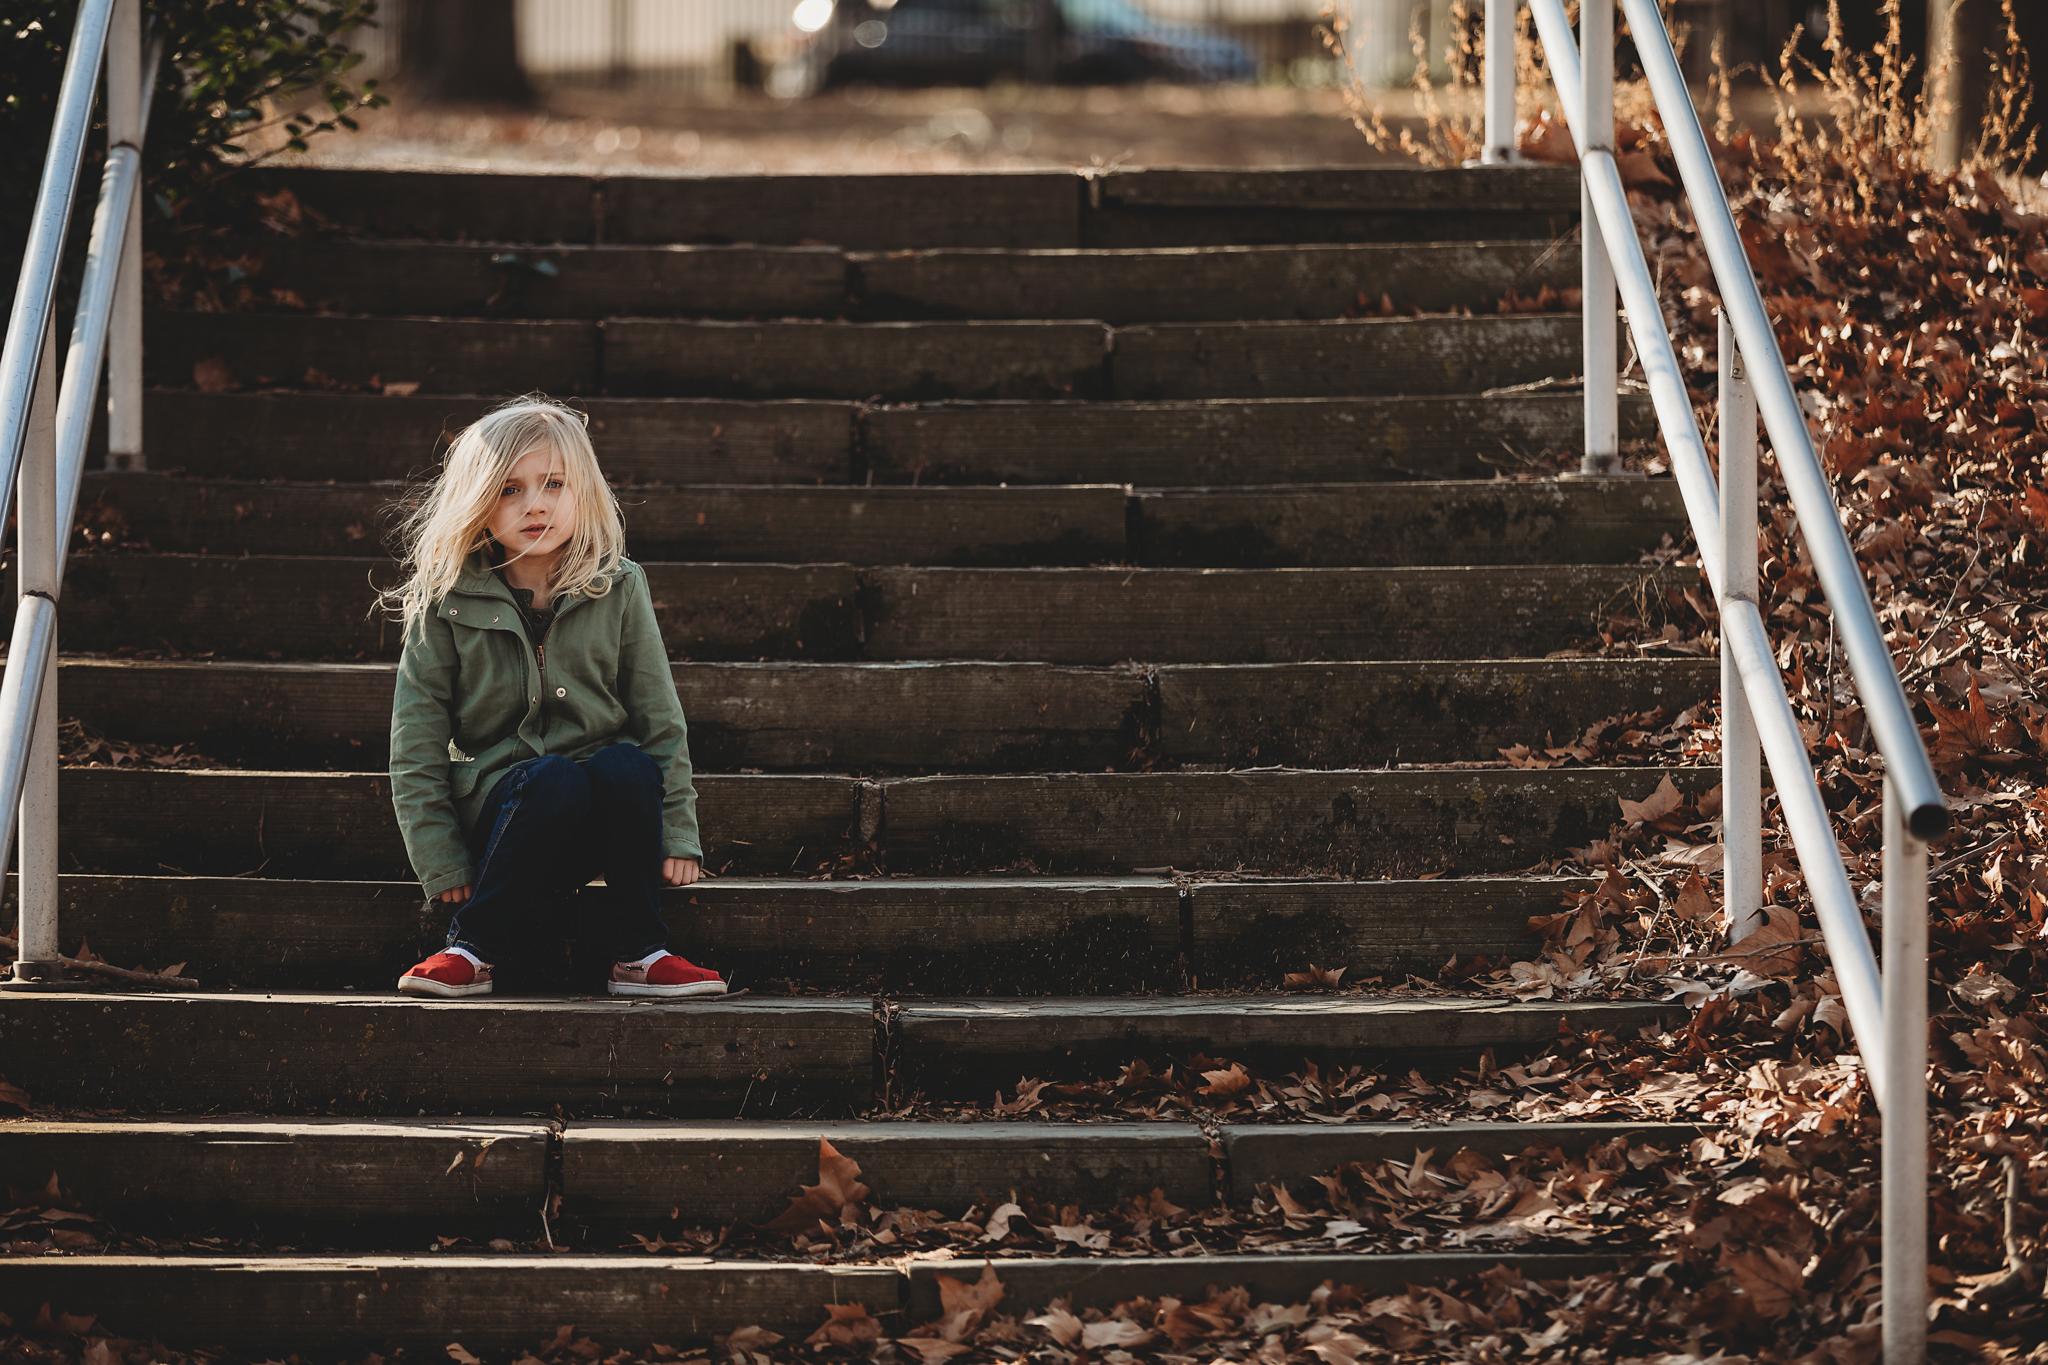 Long-island-photographer-hello-olivia-photography-children-kids-photos-new-york-lifestyle-portraits-suffolk-County-LI-6.jpg